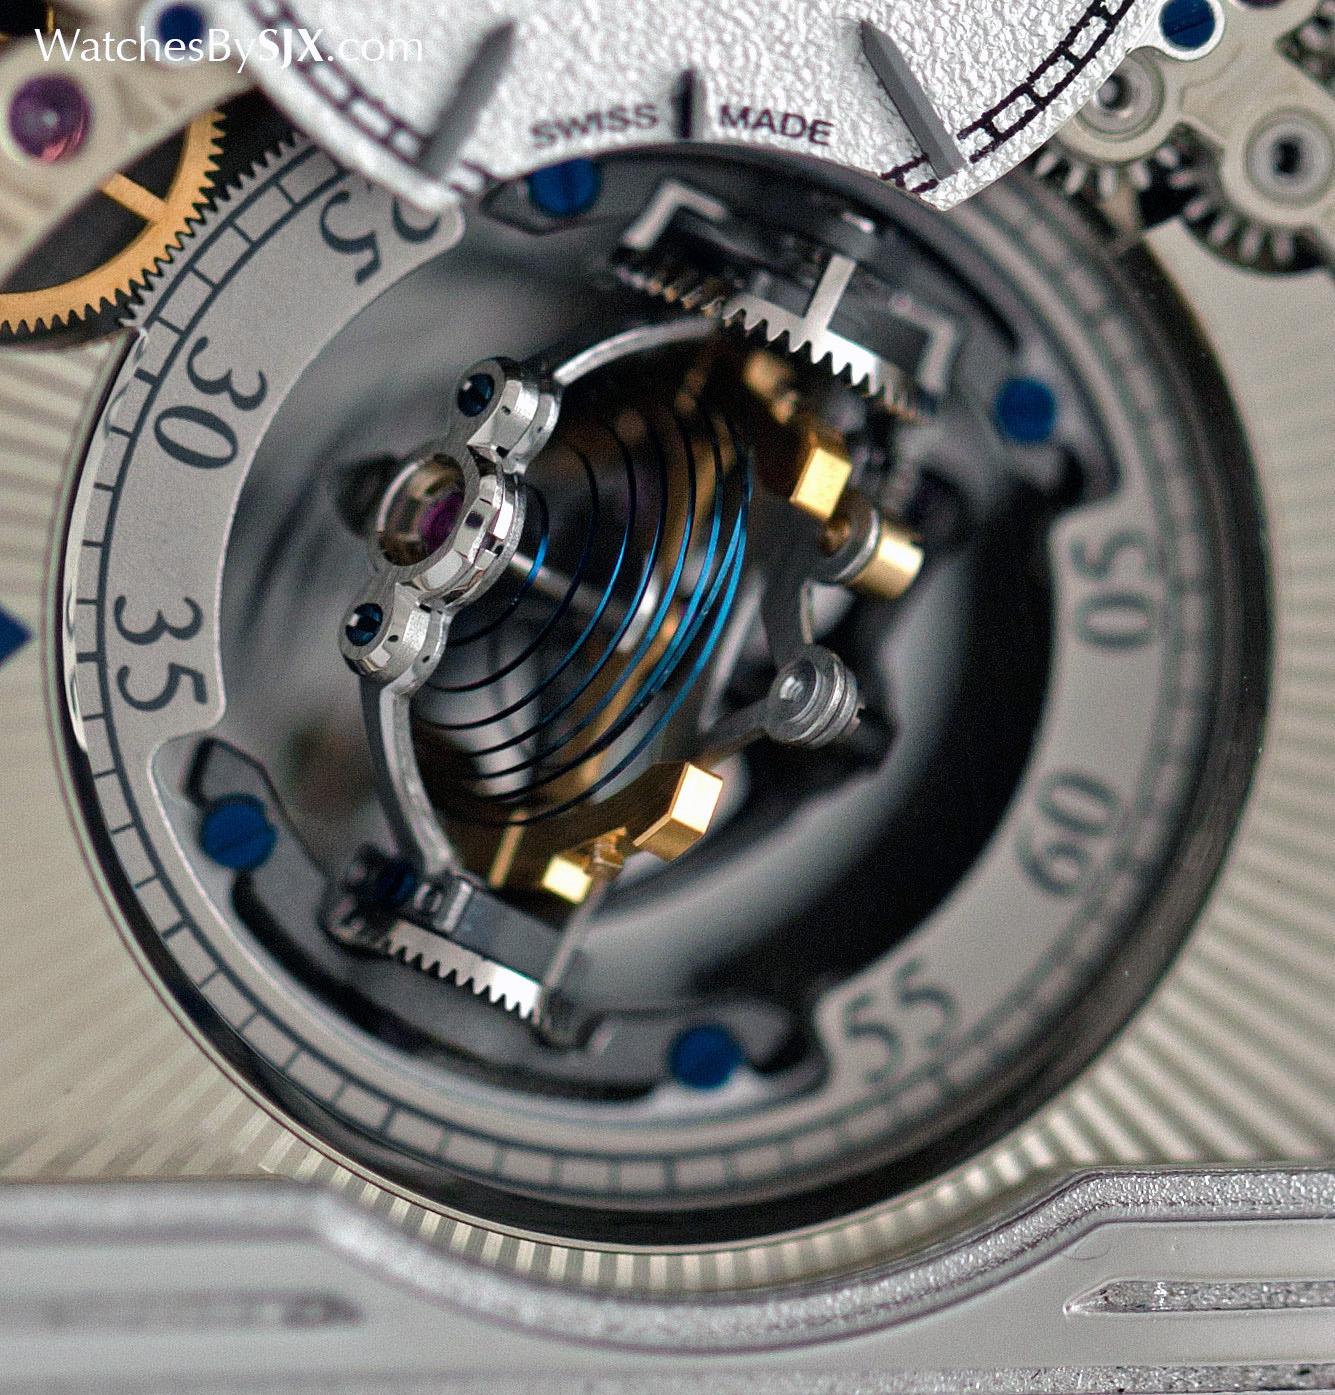 Jaeger-LeCoultre Reverso Tribute Gyrotourbillon platinum 5